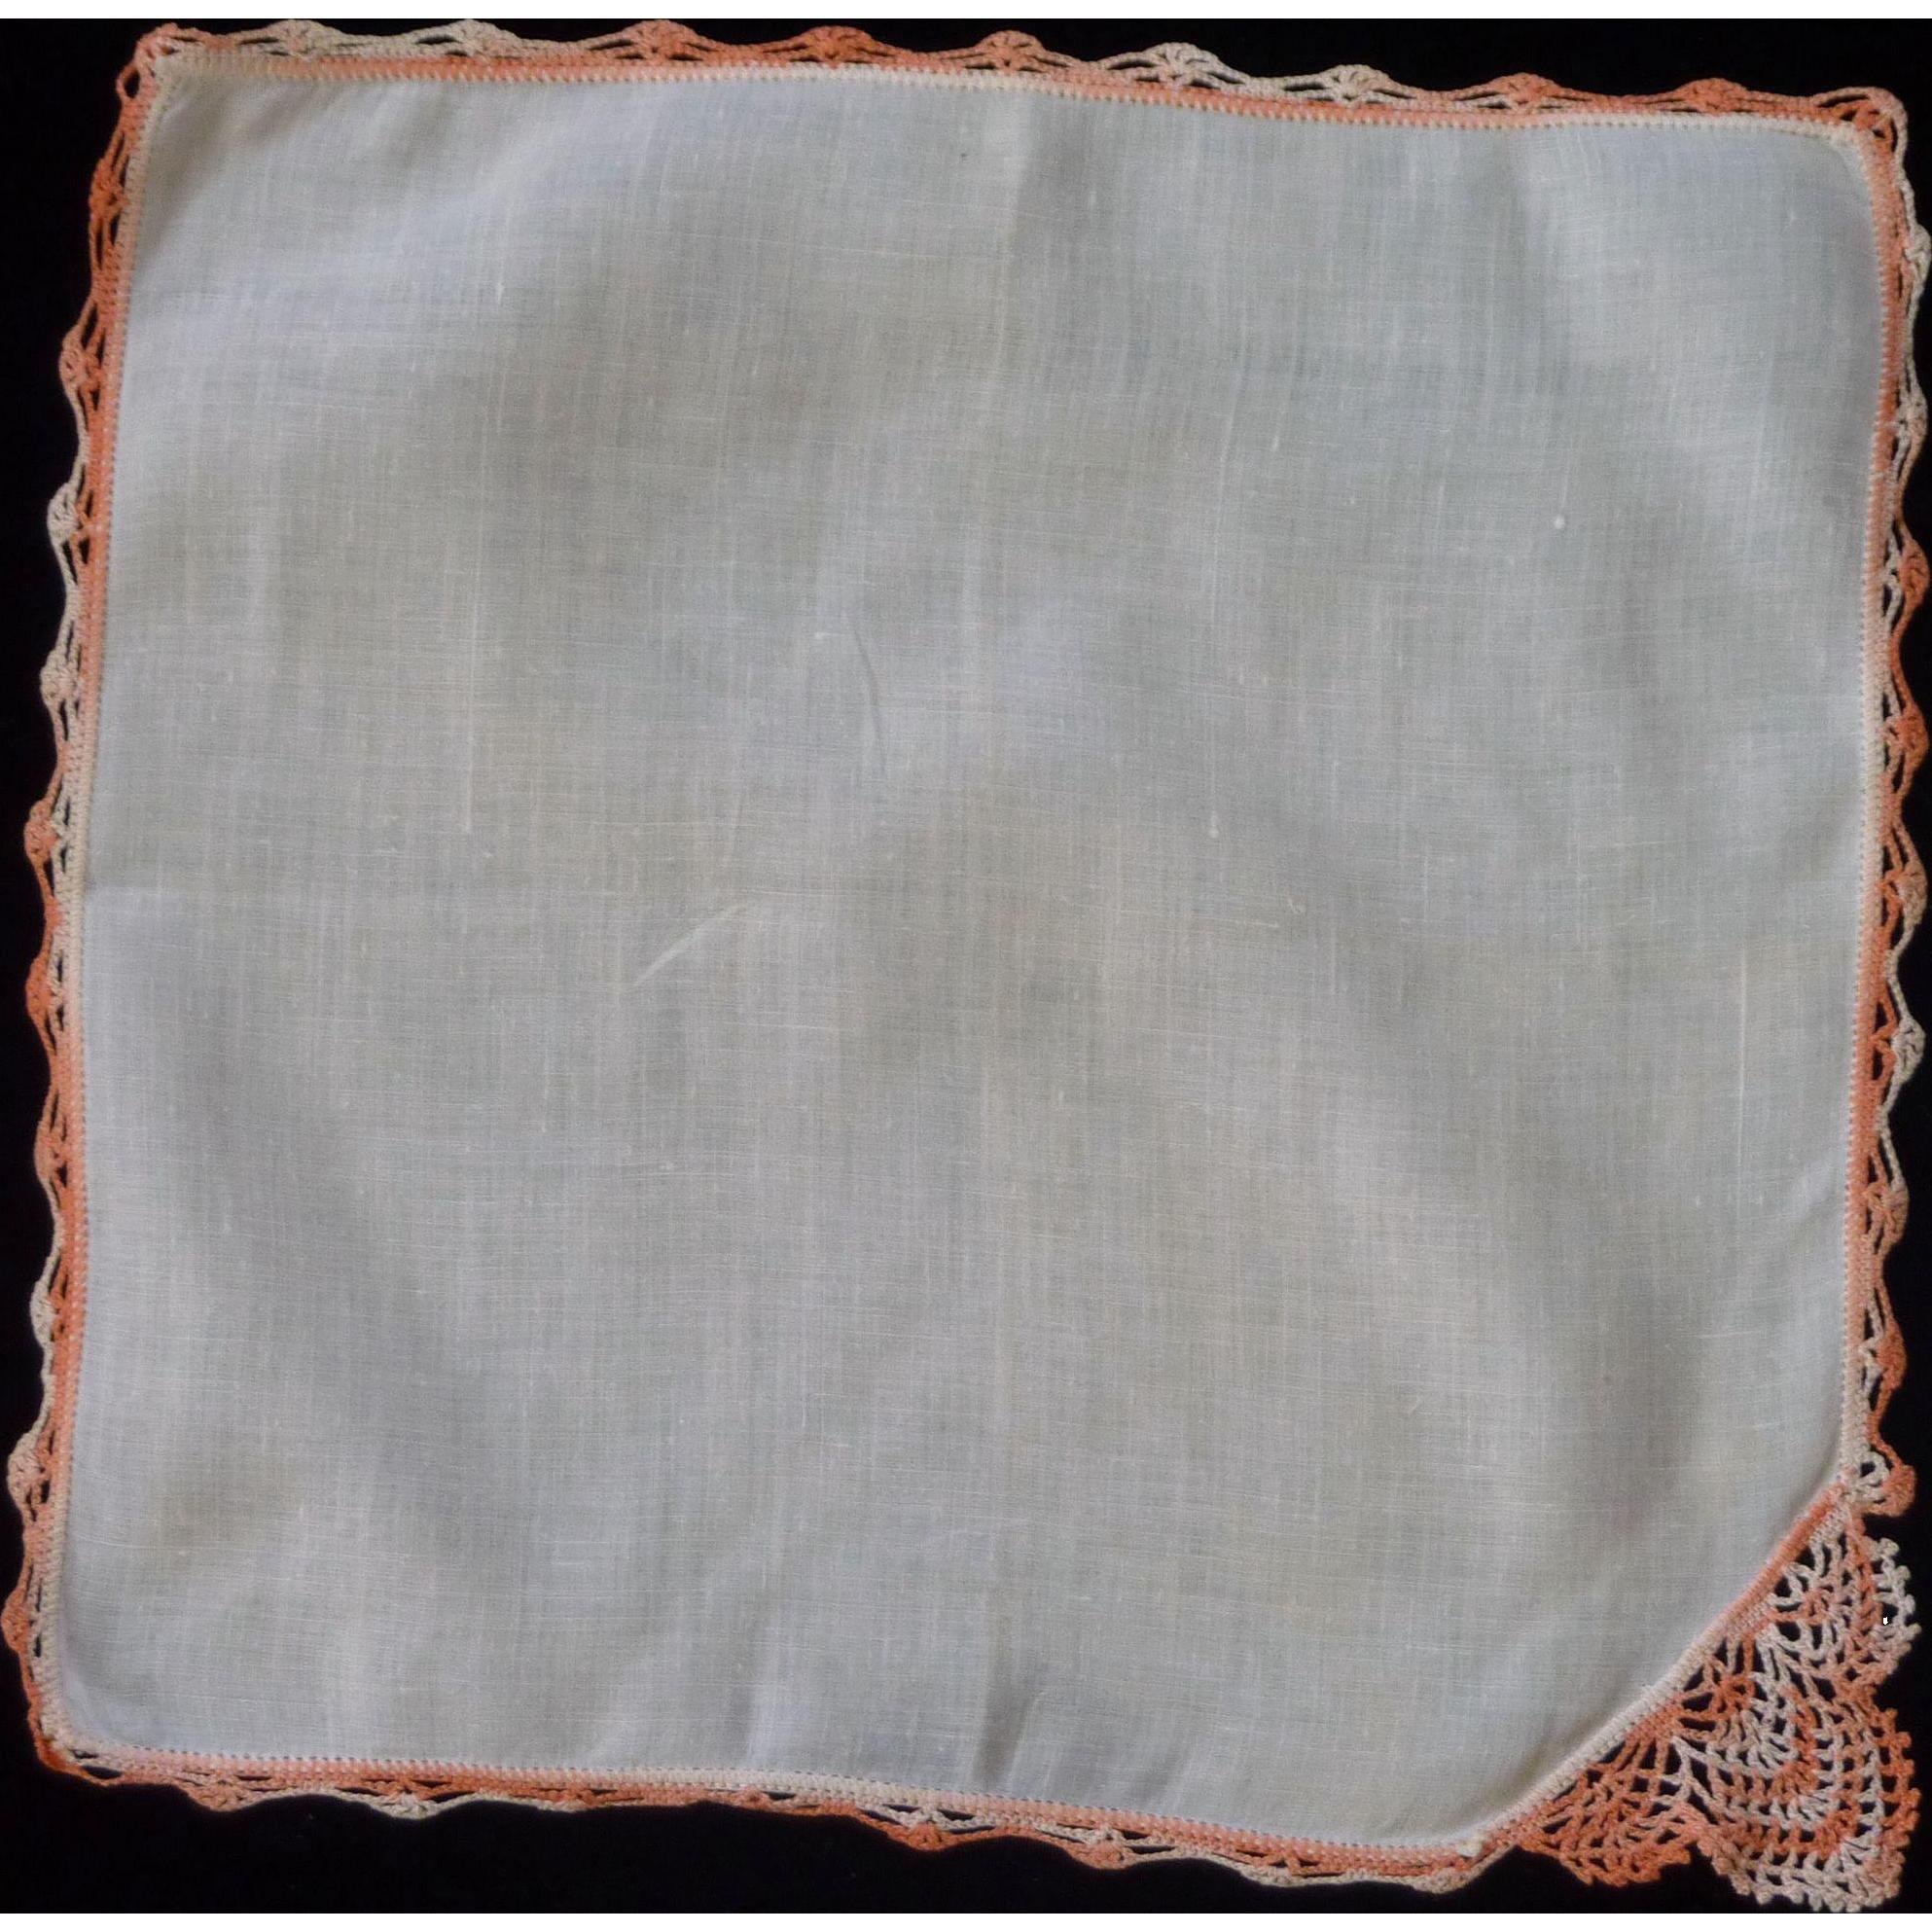 Salmon and White Variegated White Linen Handkerchief